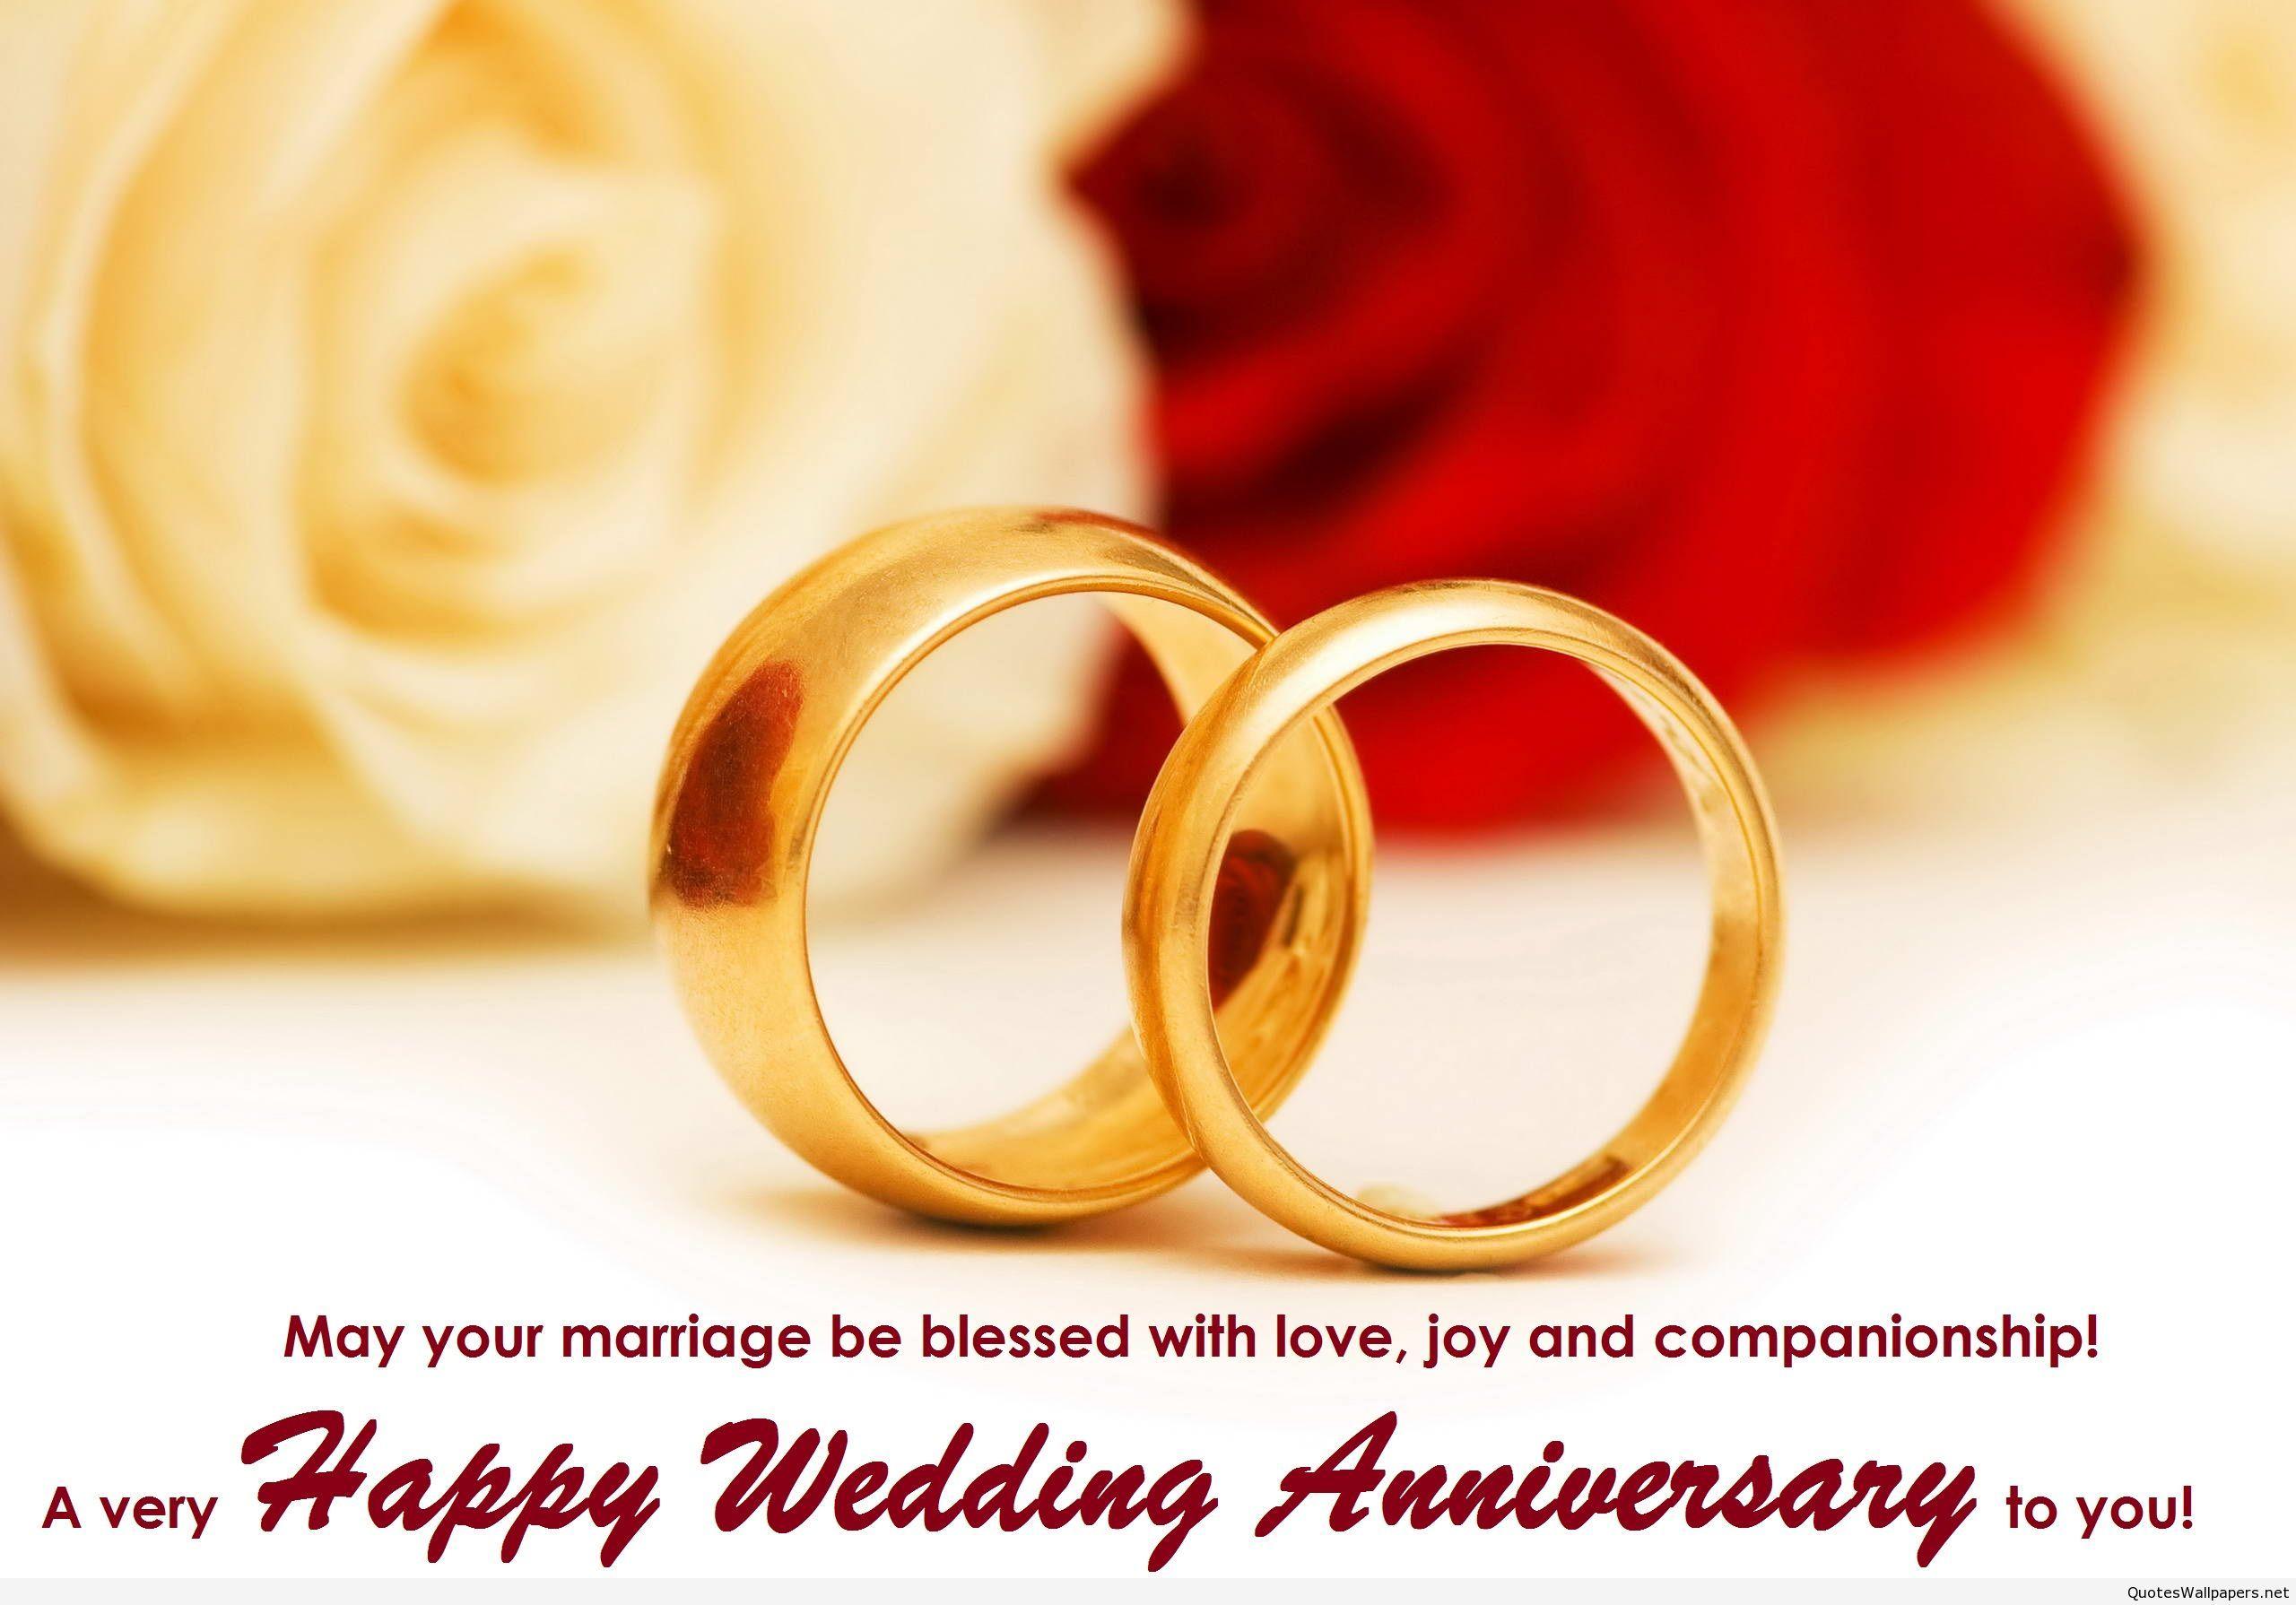 Happy Wedding Anniversary Greetings For Husbandcaption Www